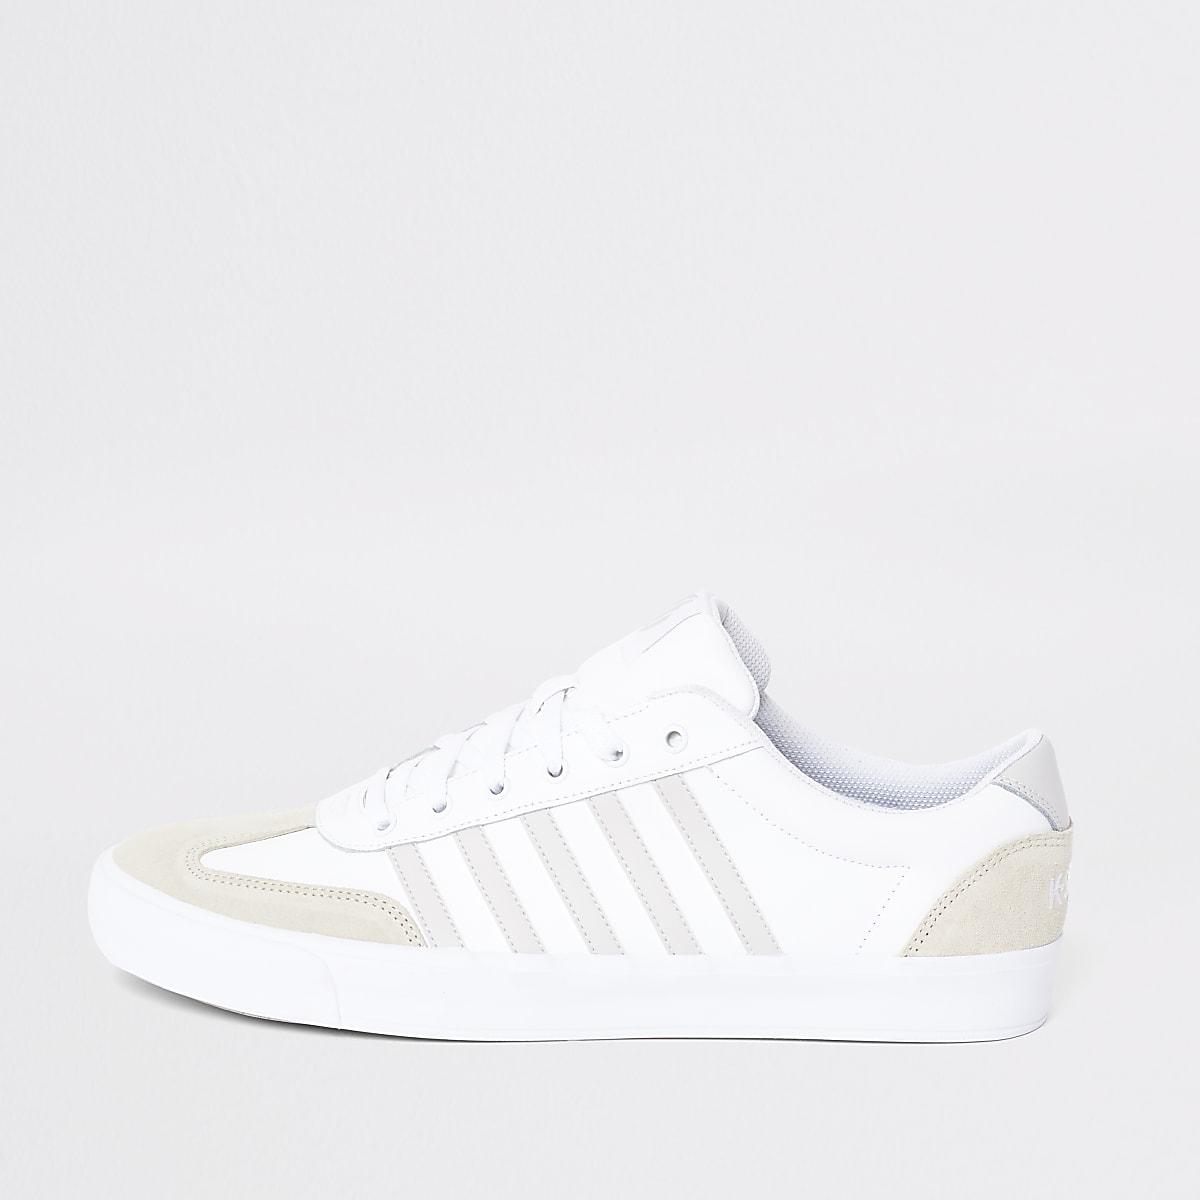 44efa4ba1da K-Swiss Addison - Witte leren senakers - Sneakers - Schoenen ...